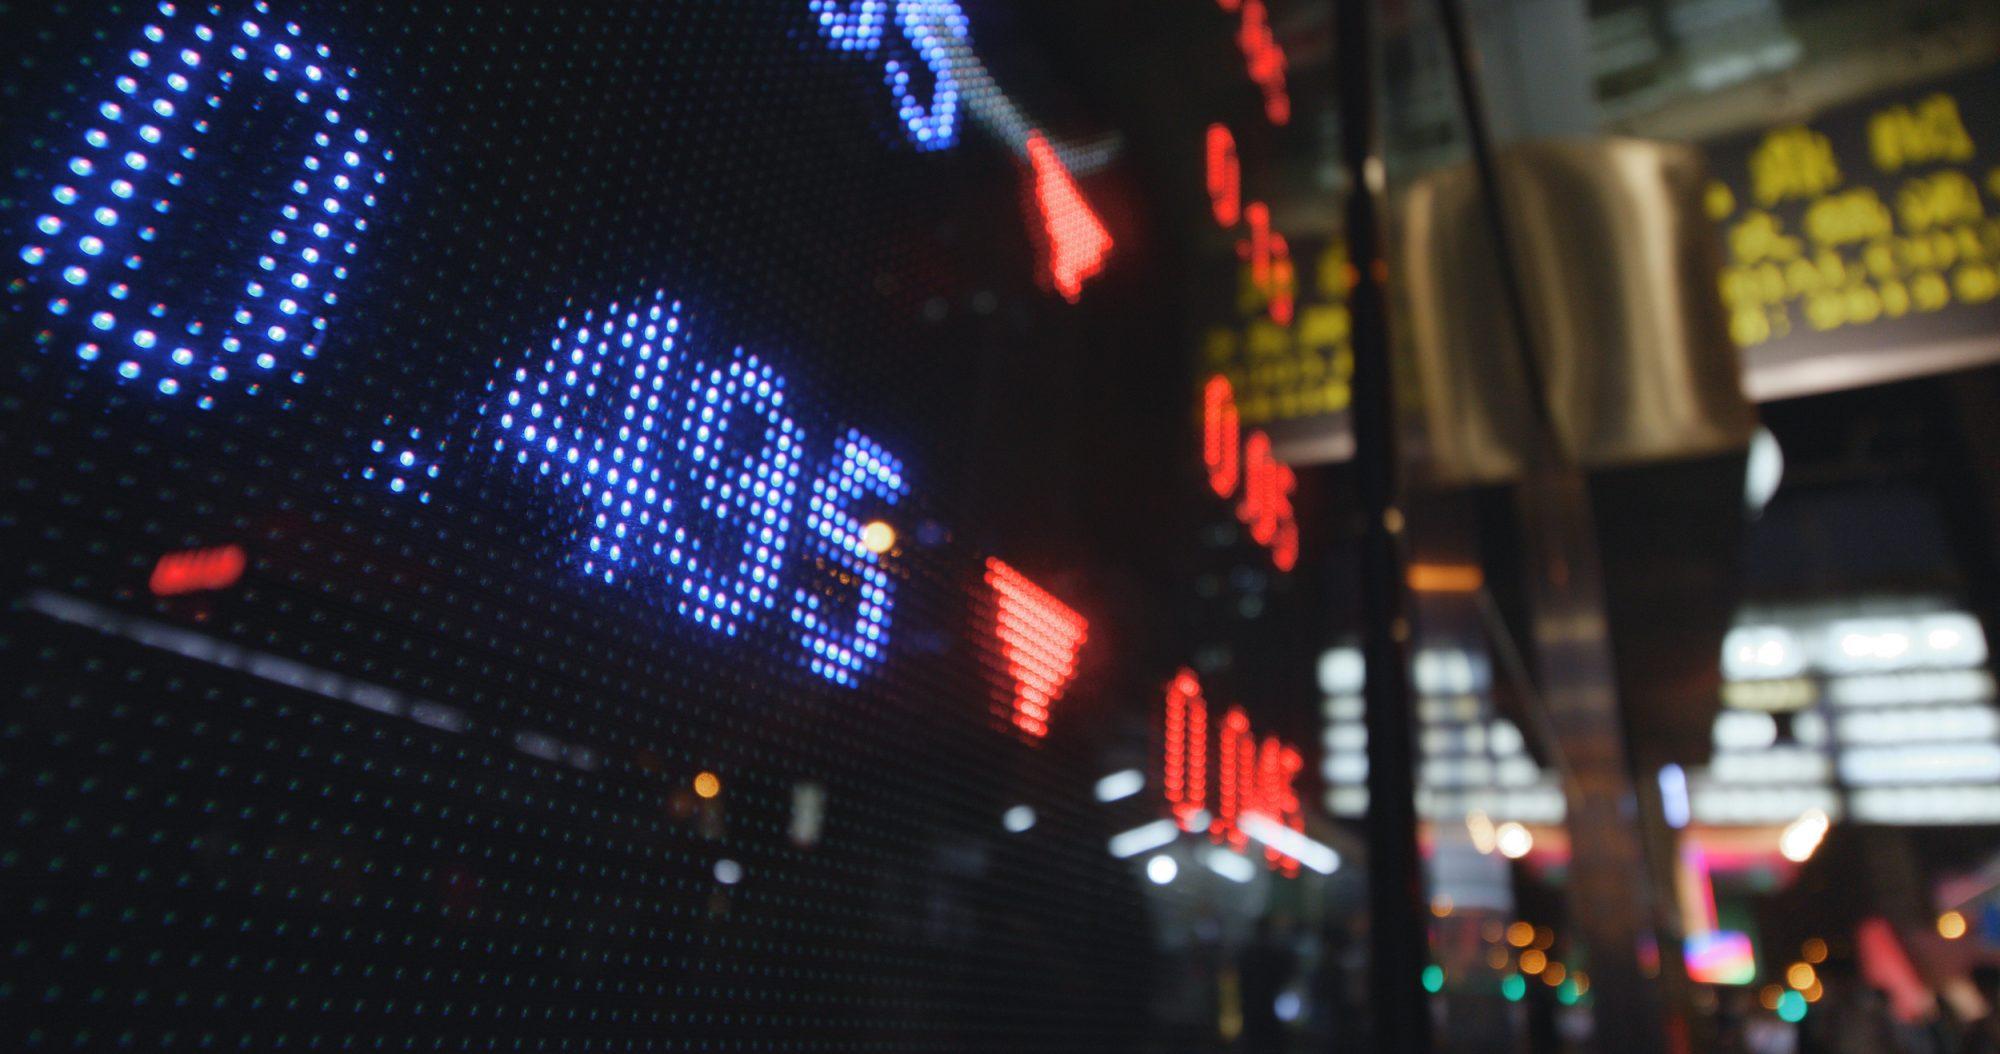 Oil Prices Fall Amid Worries Over New Coronavirus Strain